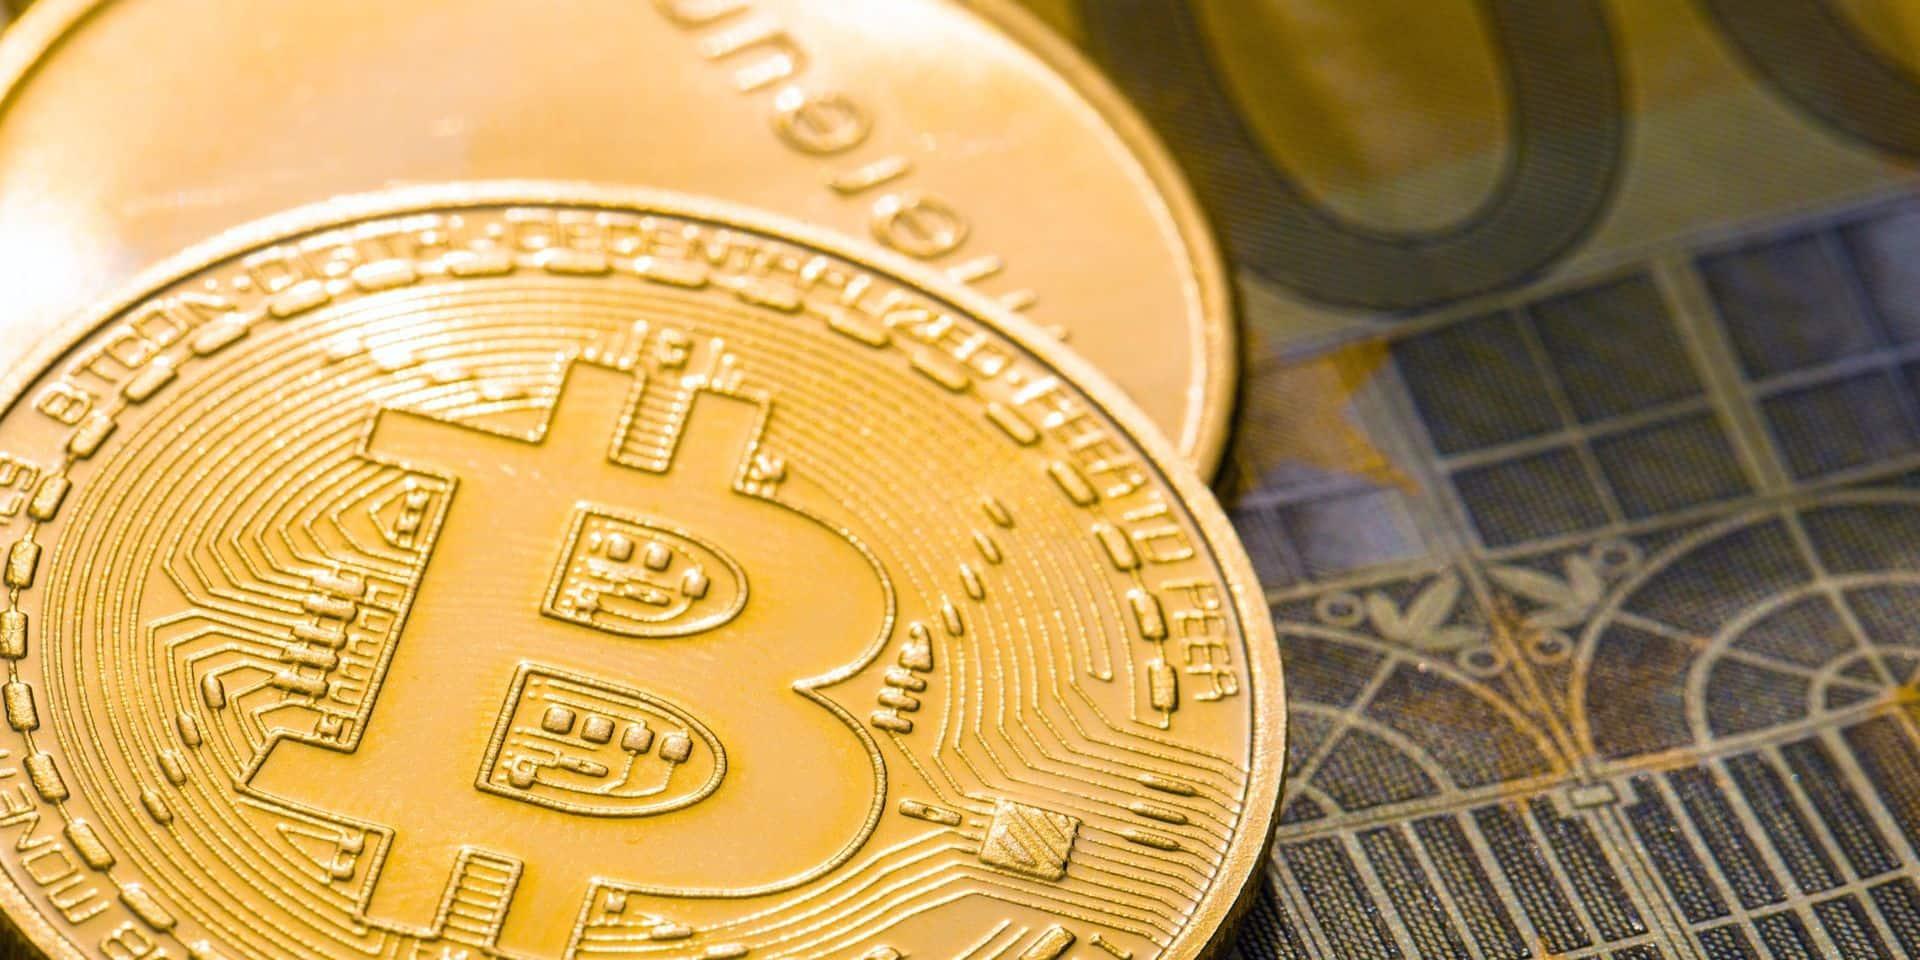 Le bitcoin explose la barre des 38.000 dollars